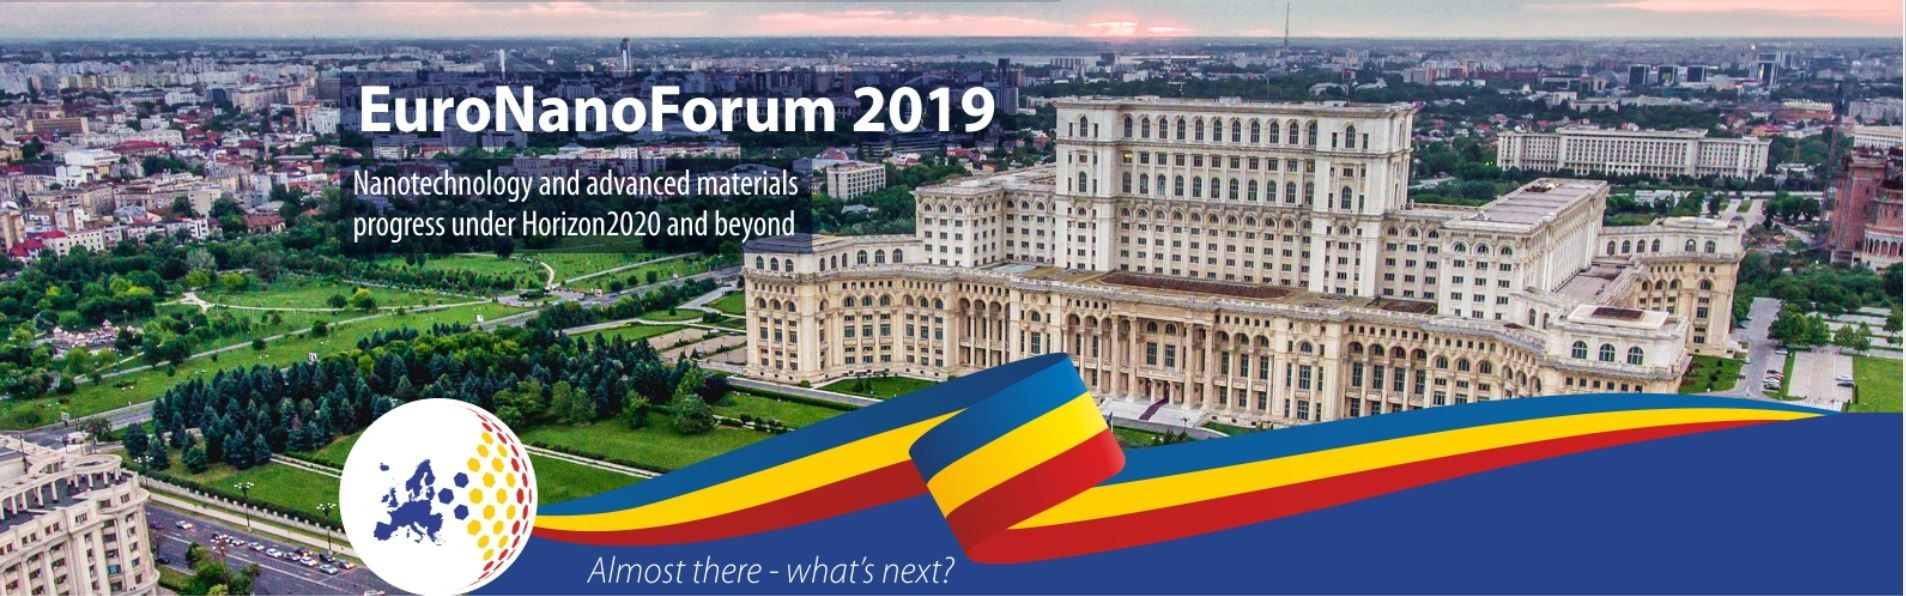 Conferinta  EuroNanoForum 2019 - Nanotechnology and advanced materials progress under Horizon 2020 and beyond